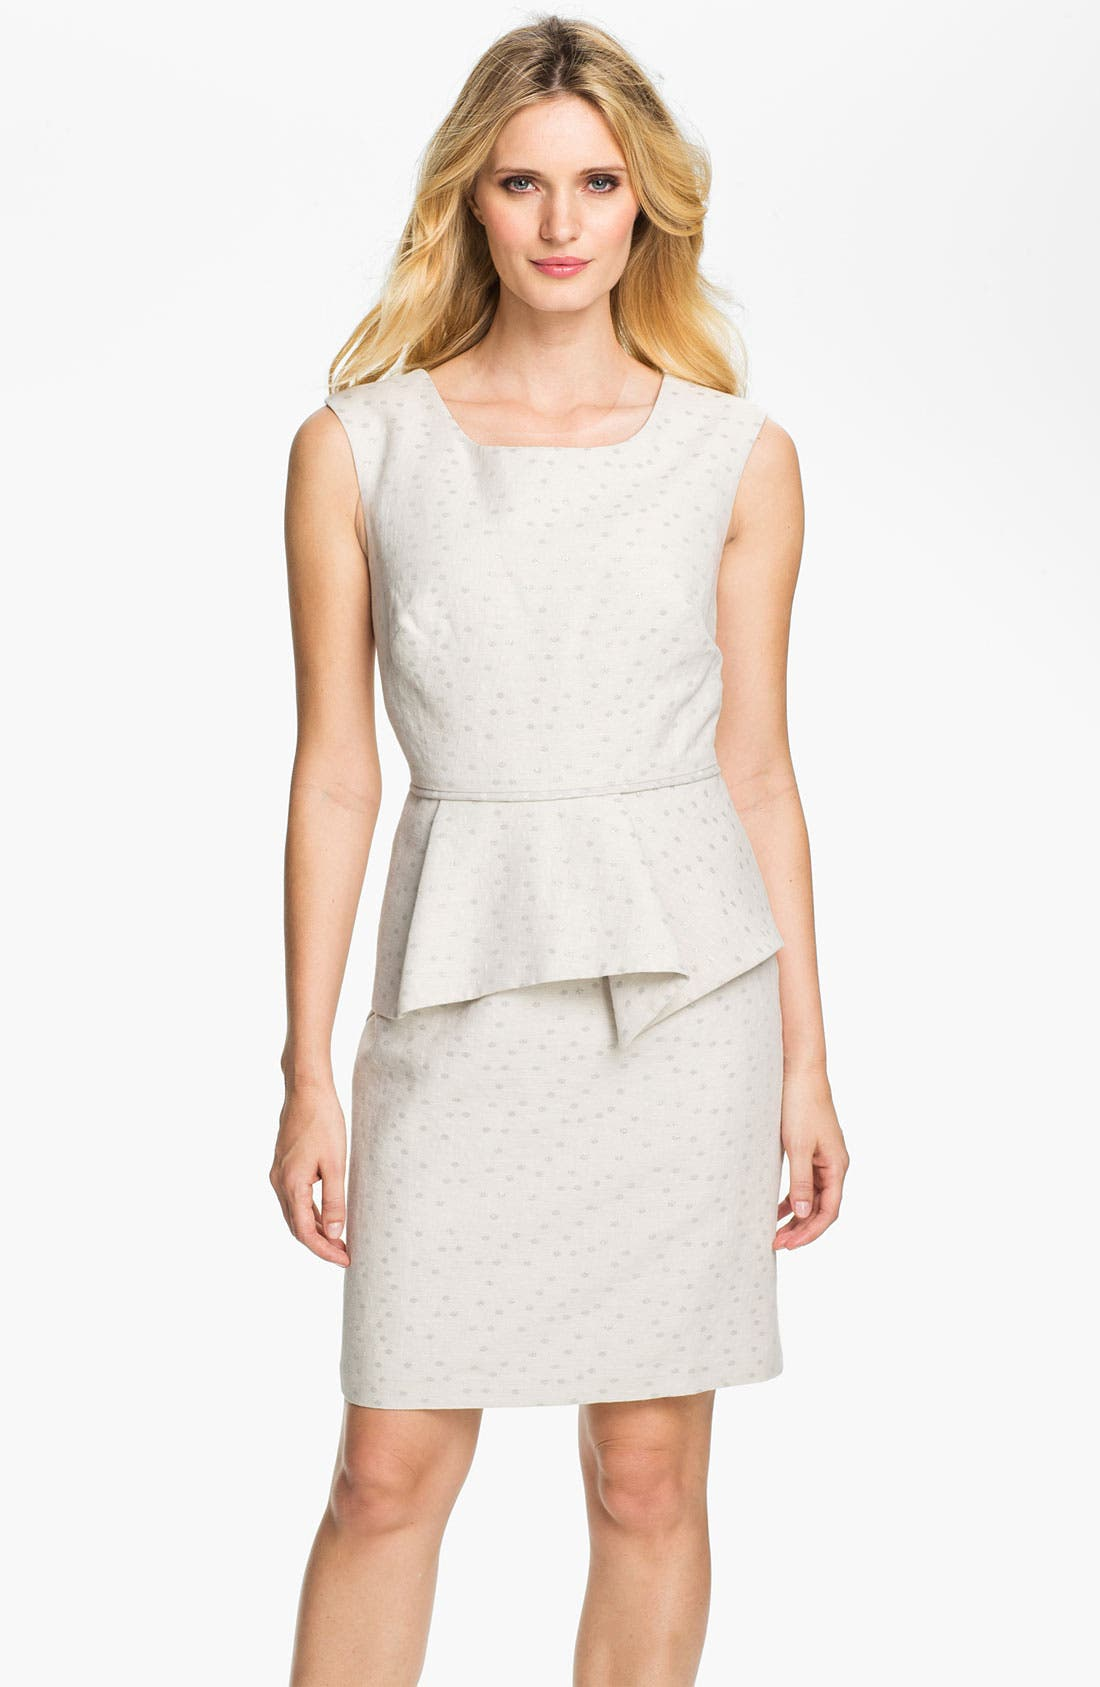 Alternate Image 1 Selected - Donna Ricco Metallic Polka Dot Peplum Dress